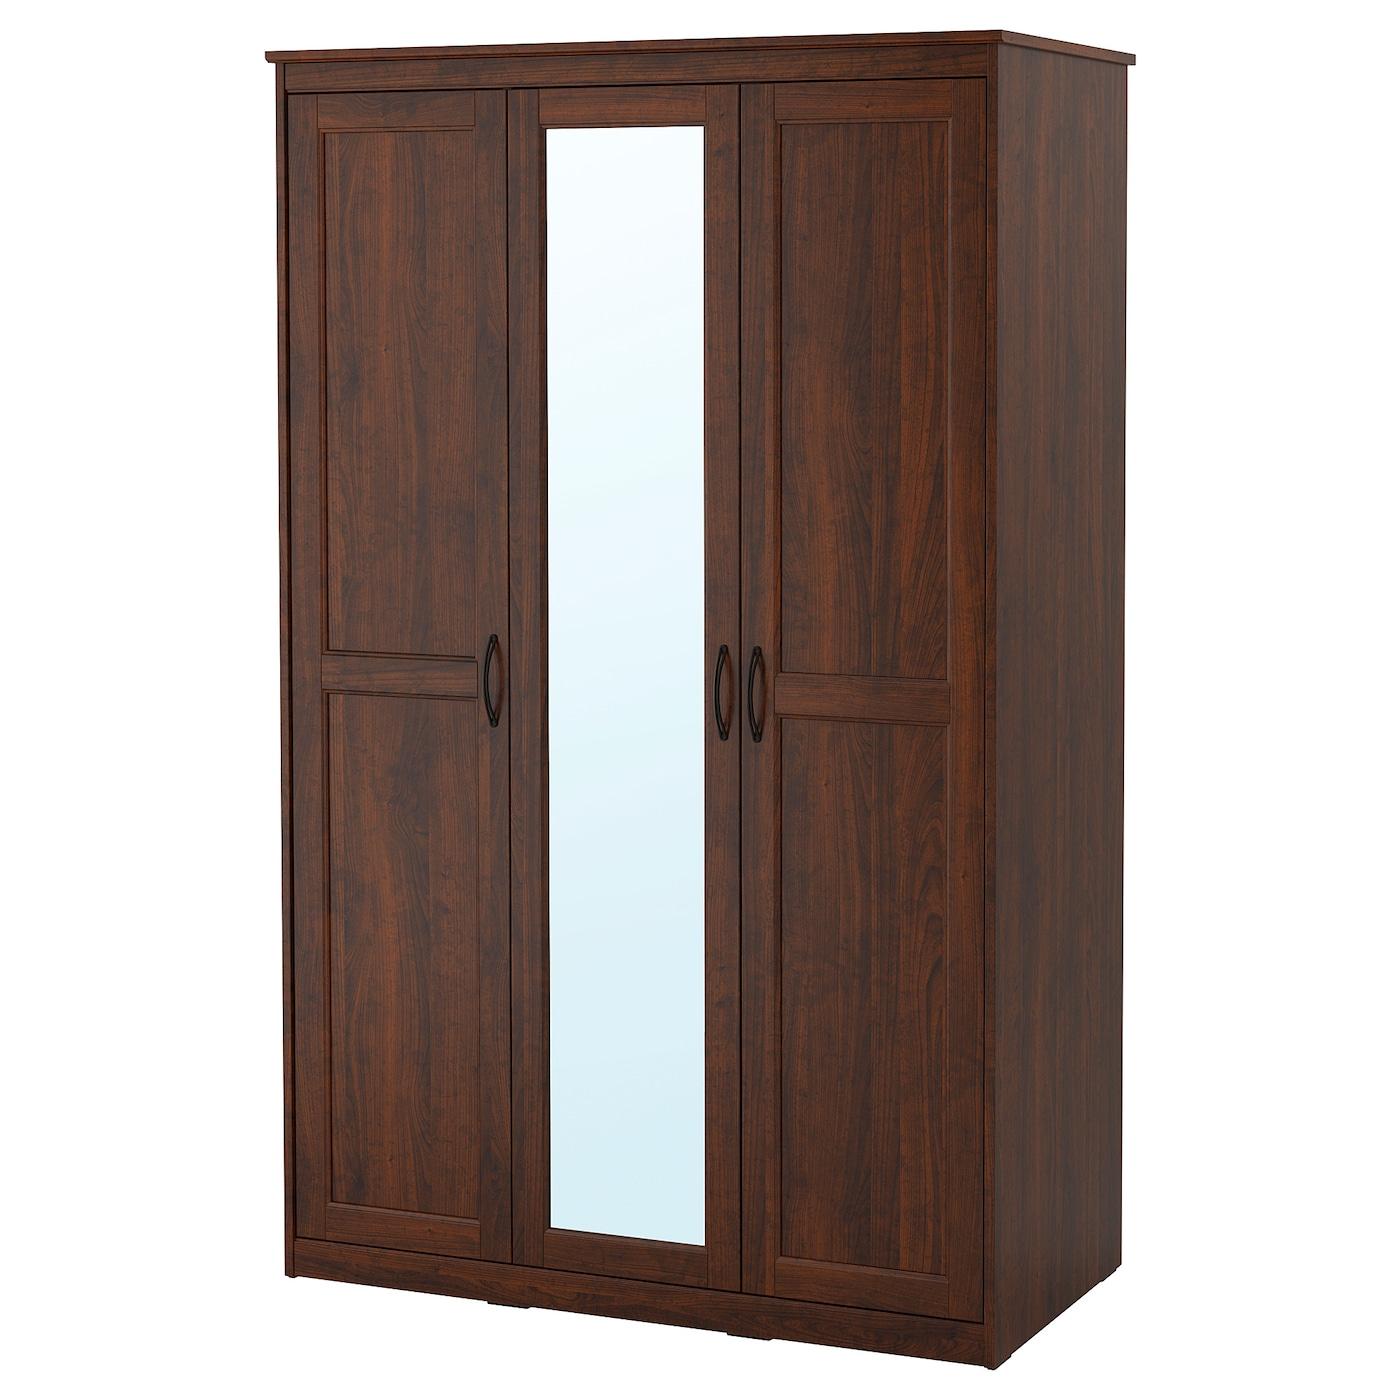 SONGESAND Wardrobe - brown - IKEA